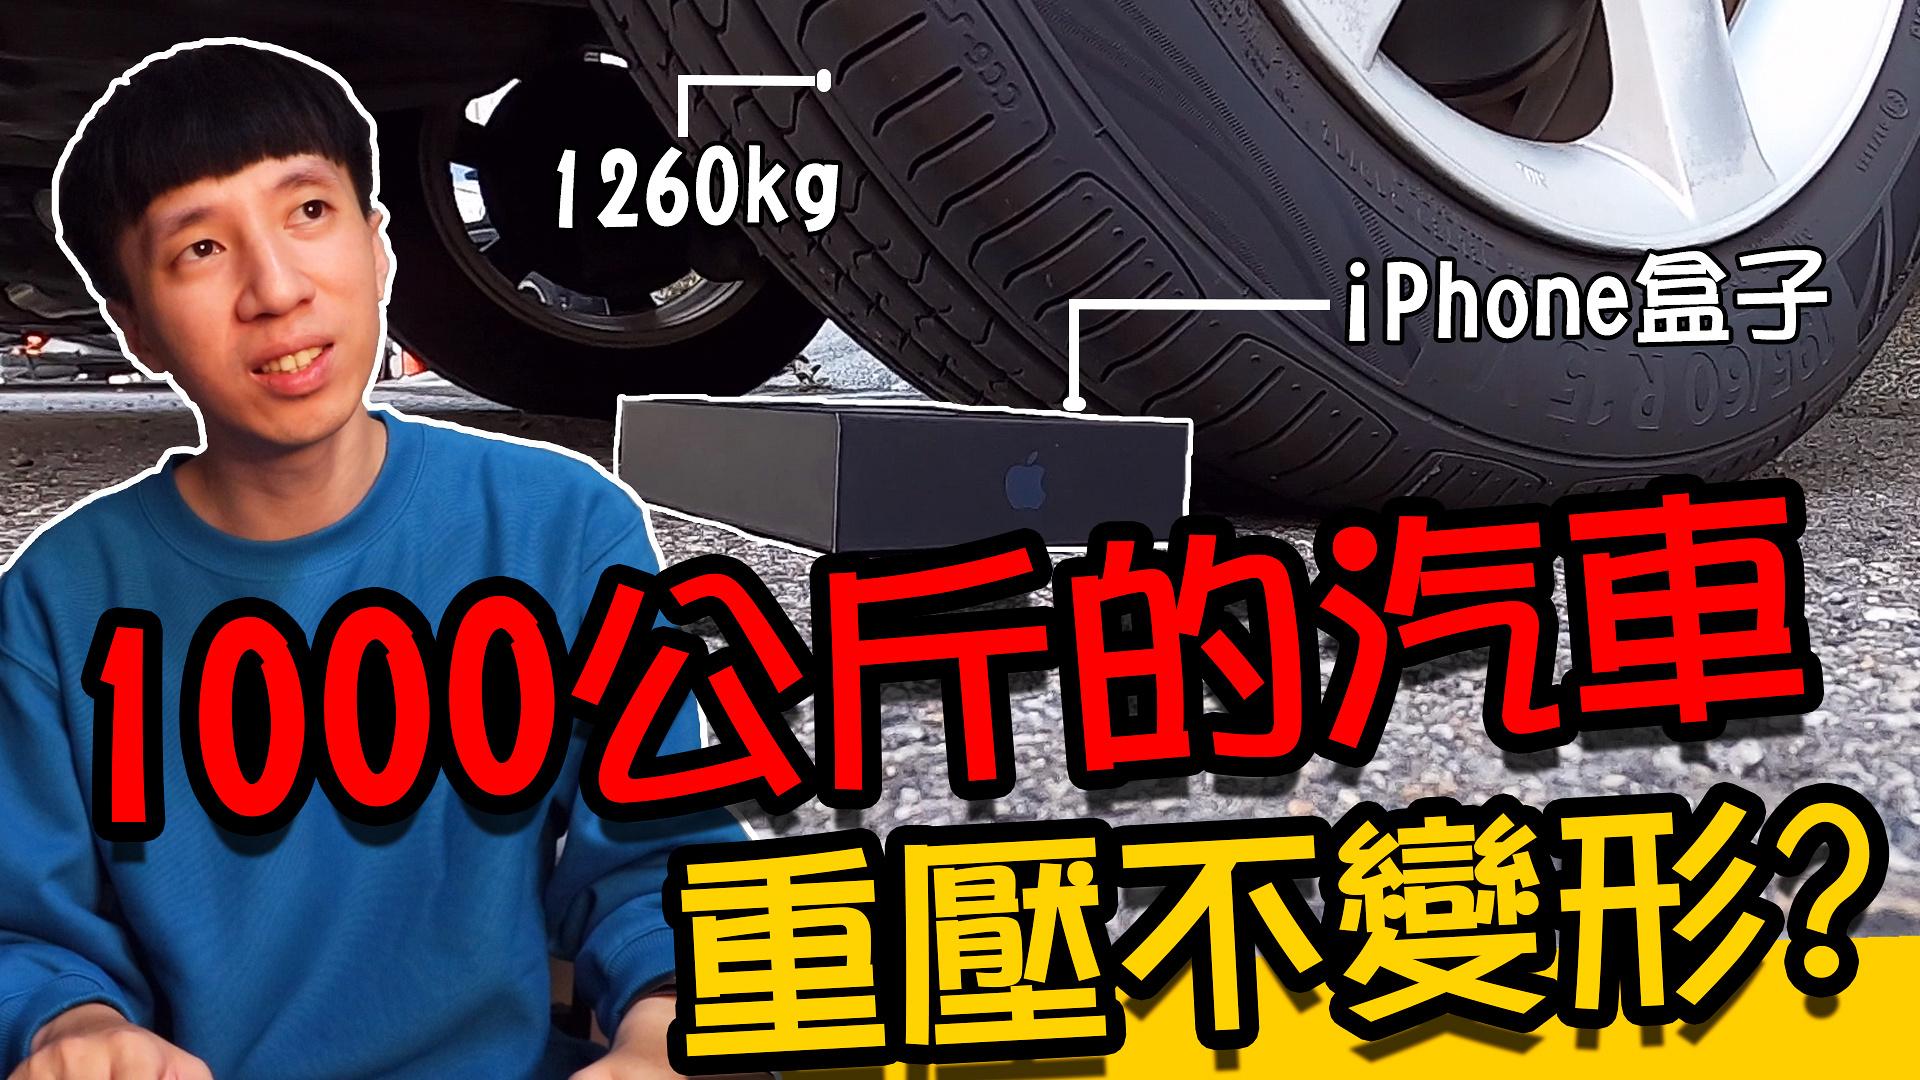 【iPhone12 pro偽開箱】實測iPhone包裝盒 真的能夠承受上千公斤重壓而不變形嗎?